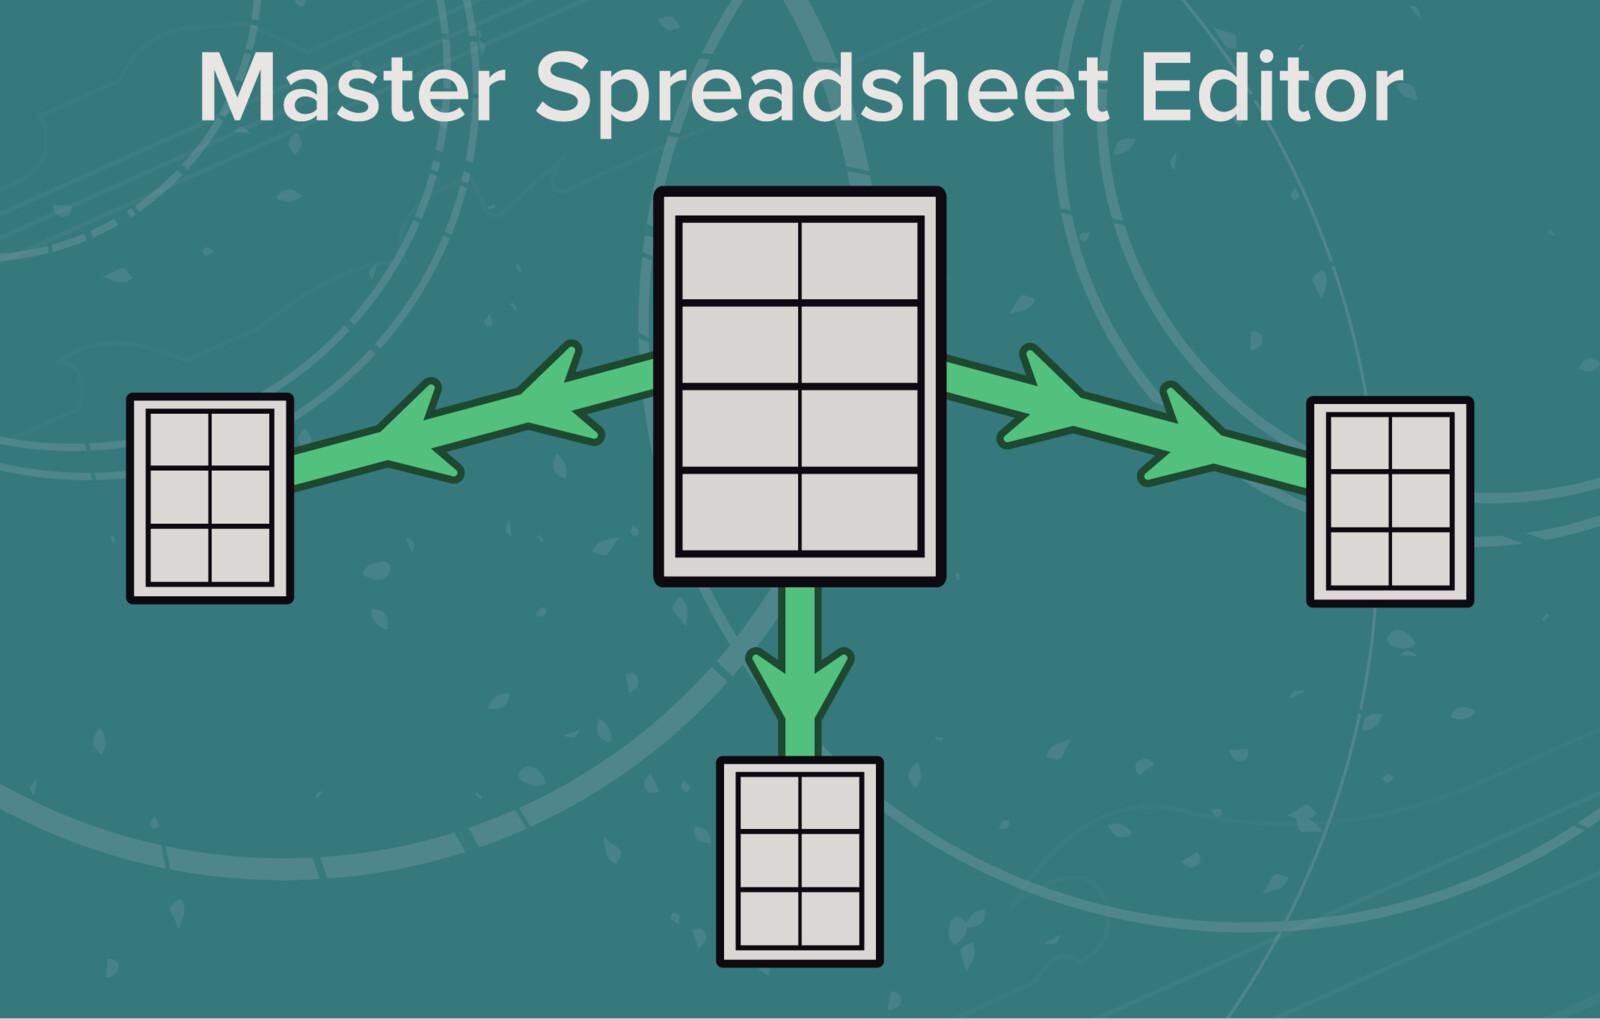 Master Spreadsheet Editor Icons